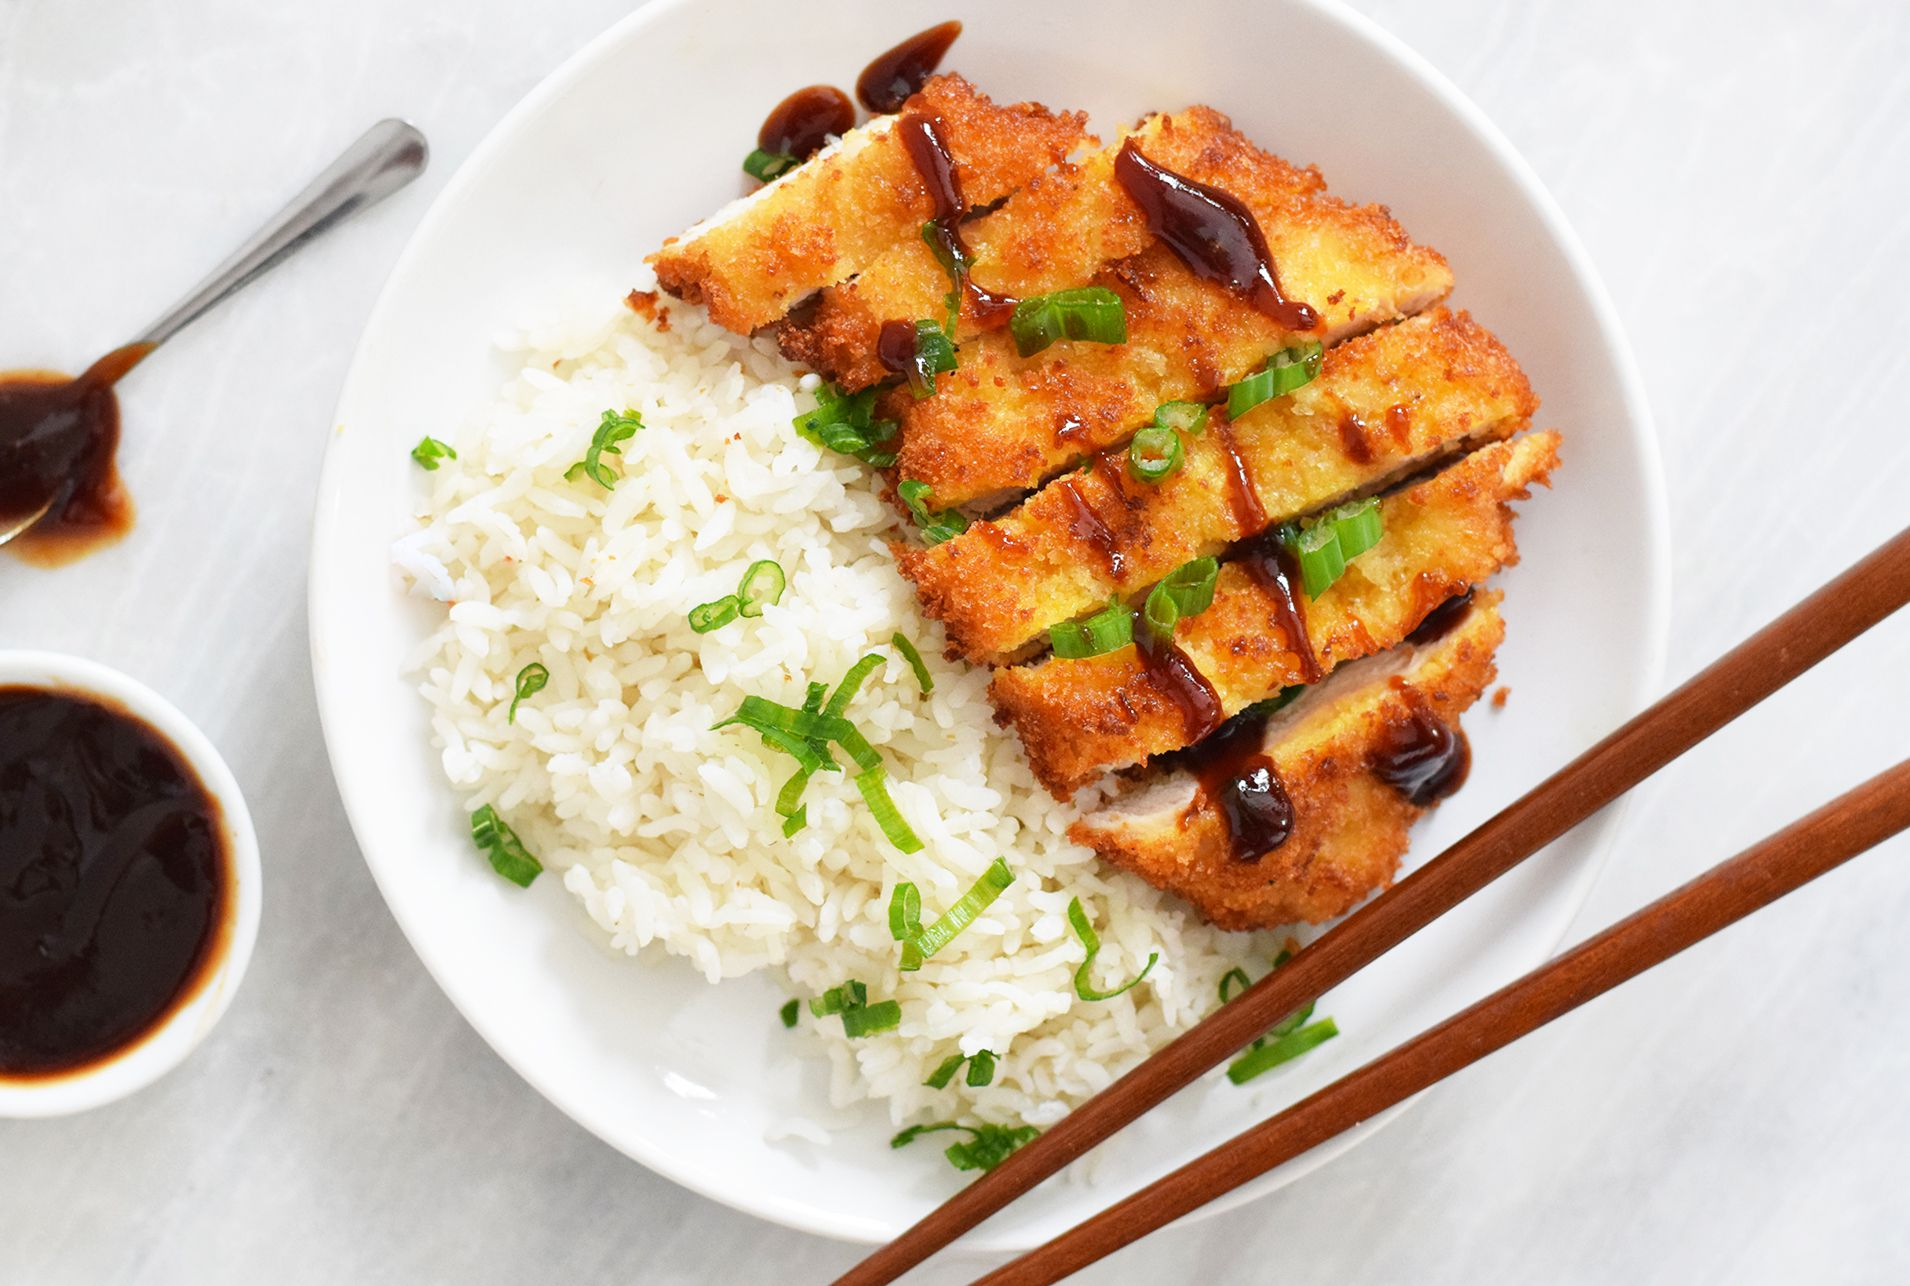 Crispy Chicken Katsu Will Become a New Dinner Staple